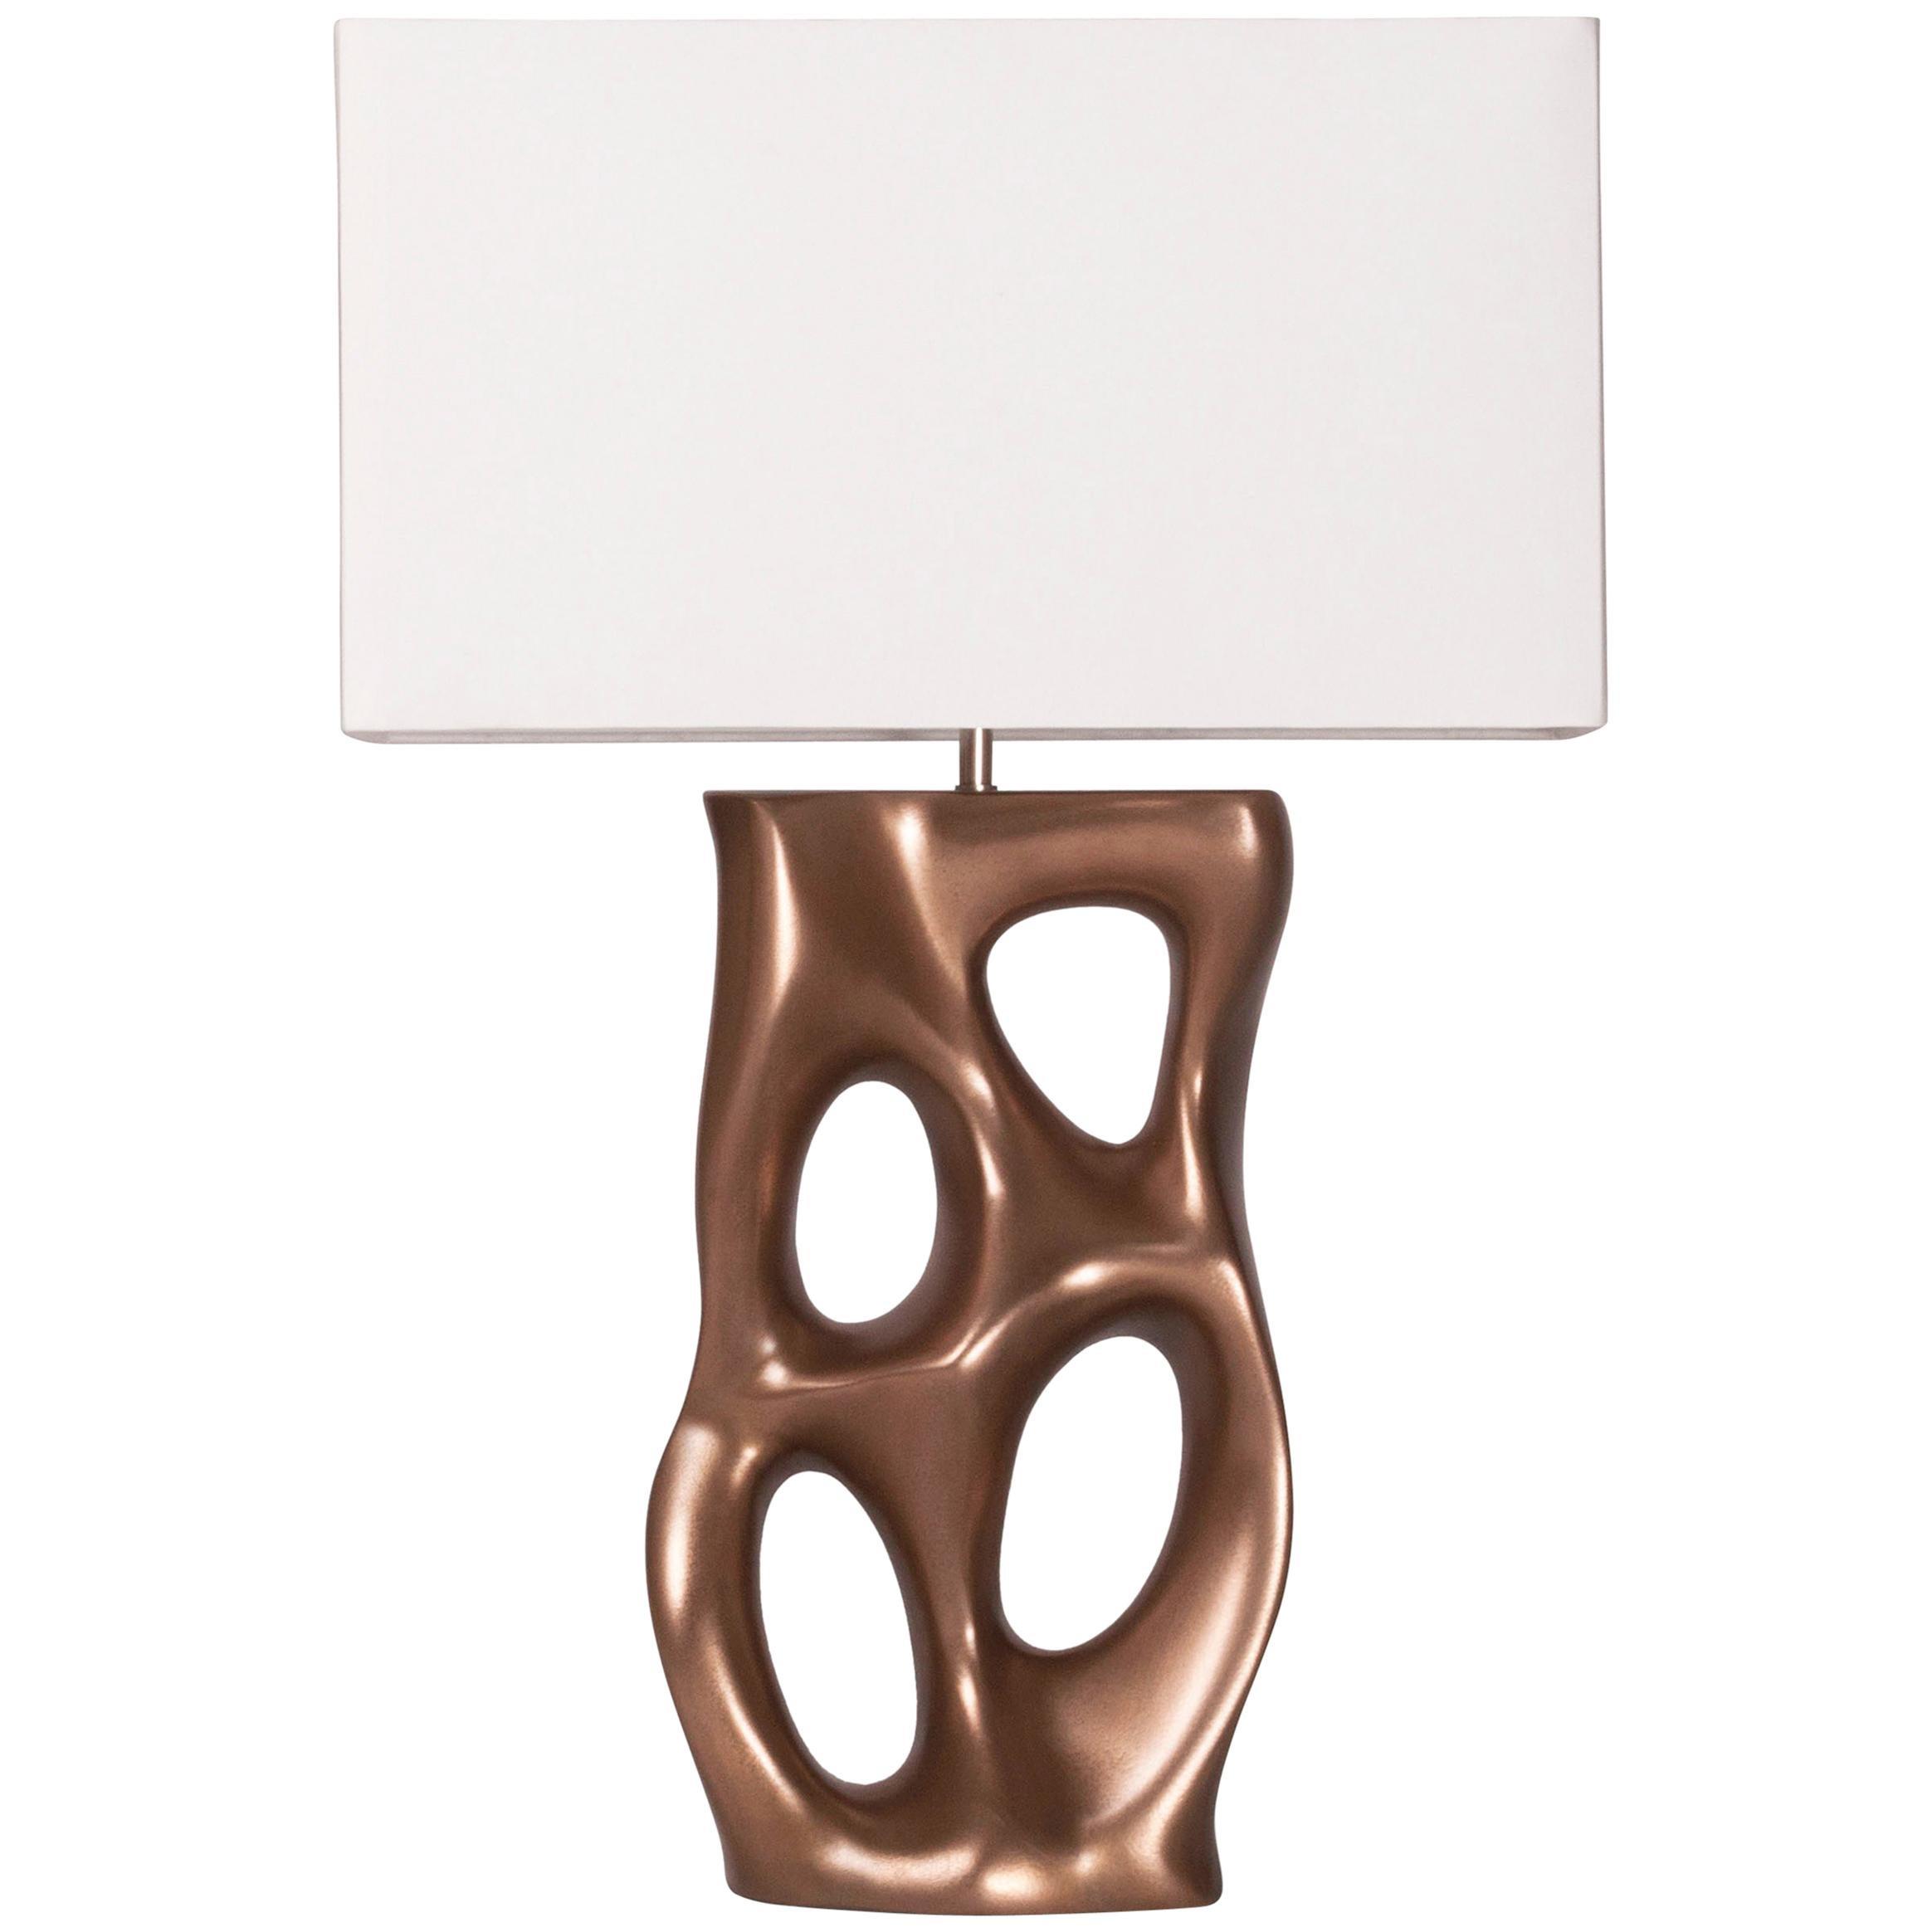 Amorph Loop Table Lamp, Gold Finish, Ivory Silk Shade